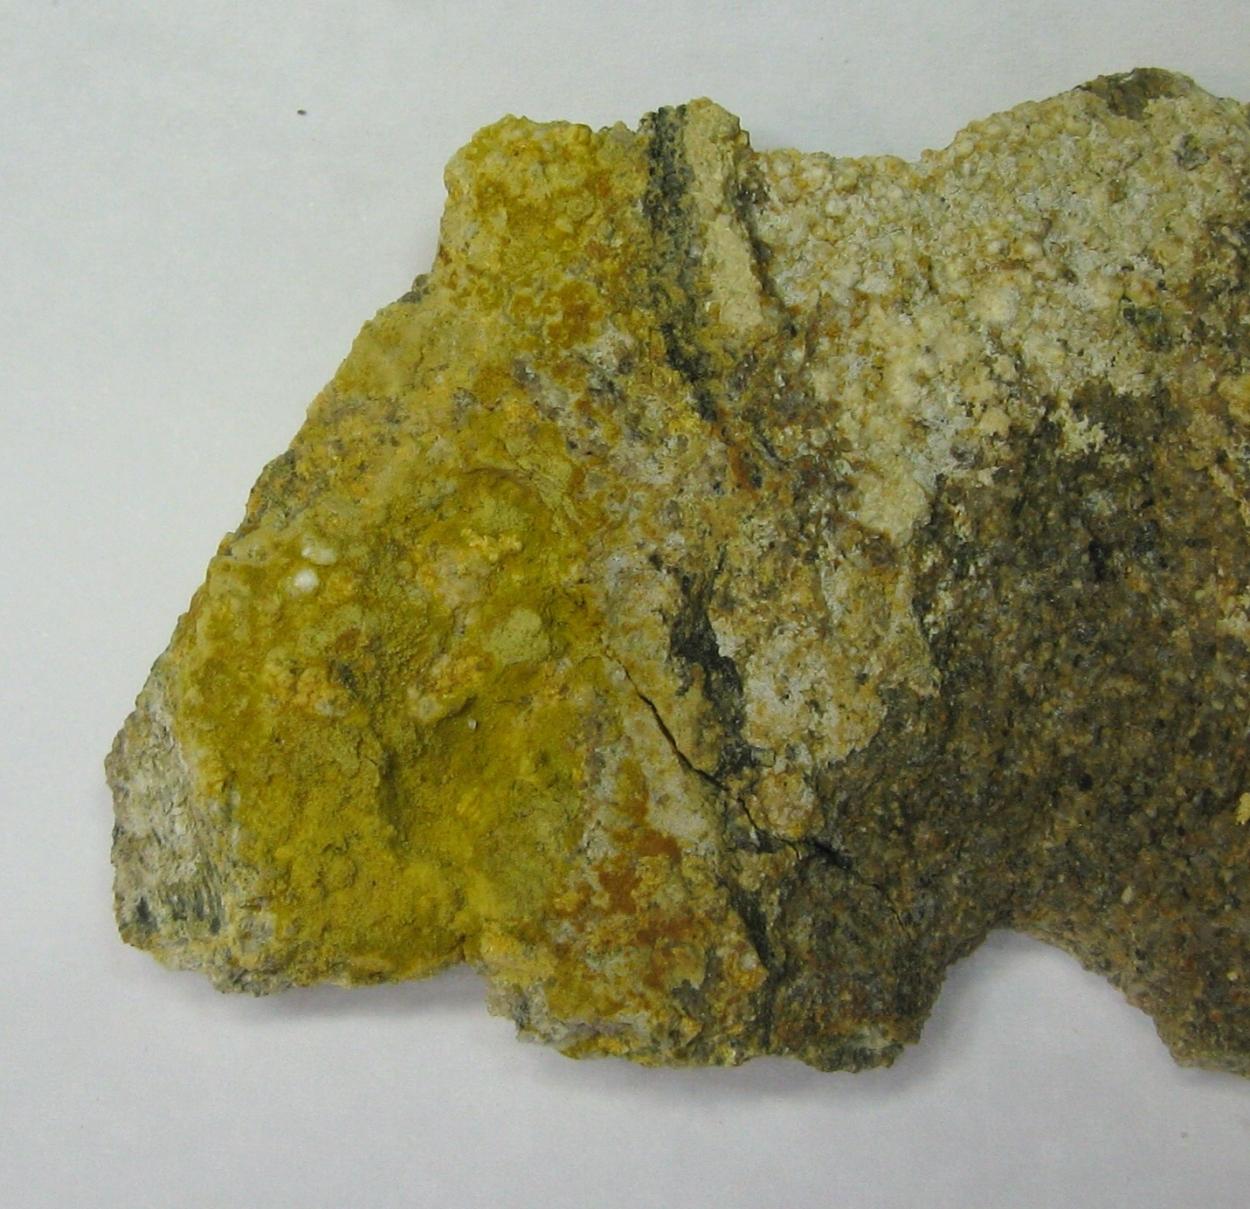 Metavoltine